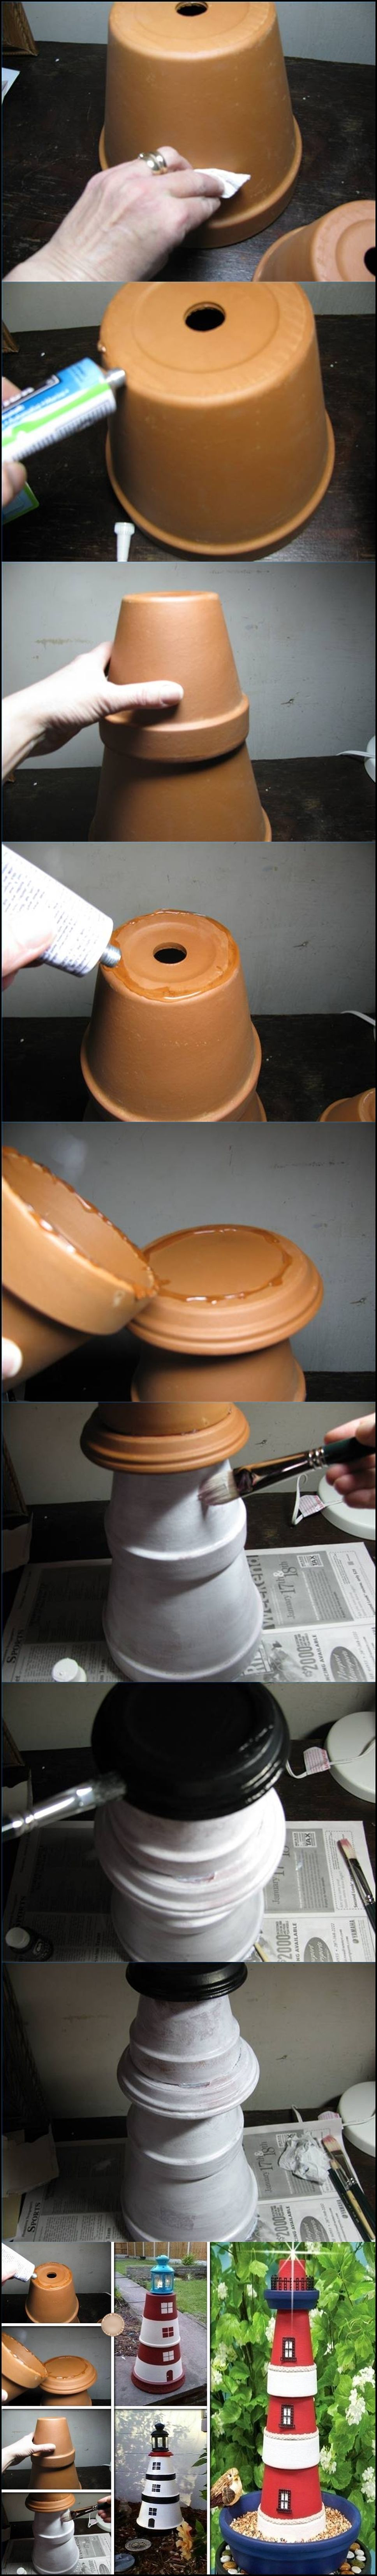 Diy make a clay pot lighthouse diy craft projects - How To Make A Terra Cotta Clay Pots Lighthouse Clay Pot Craftsdiy